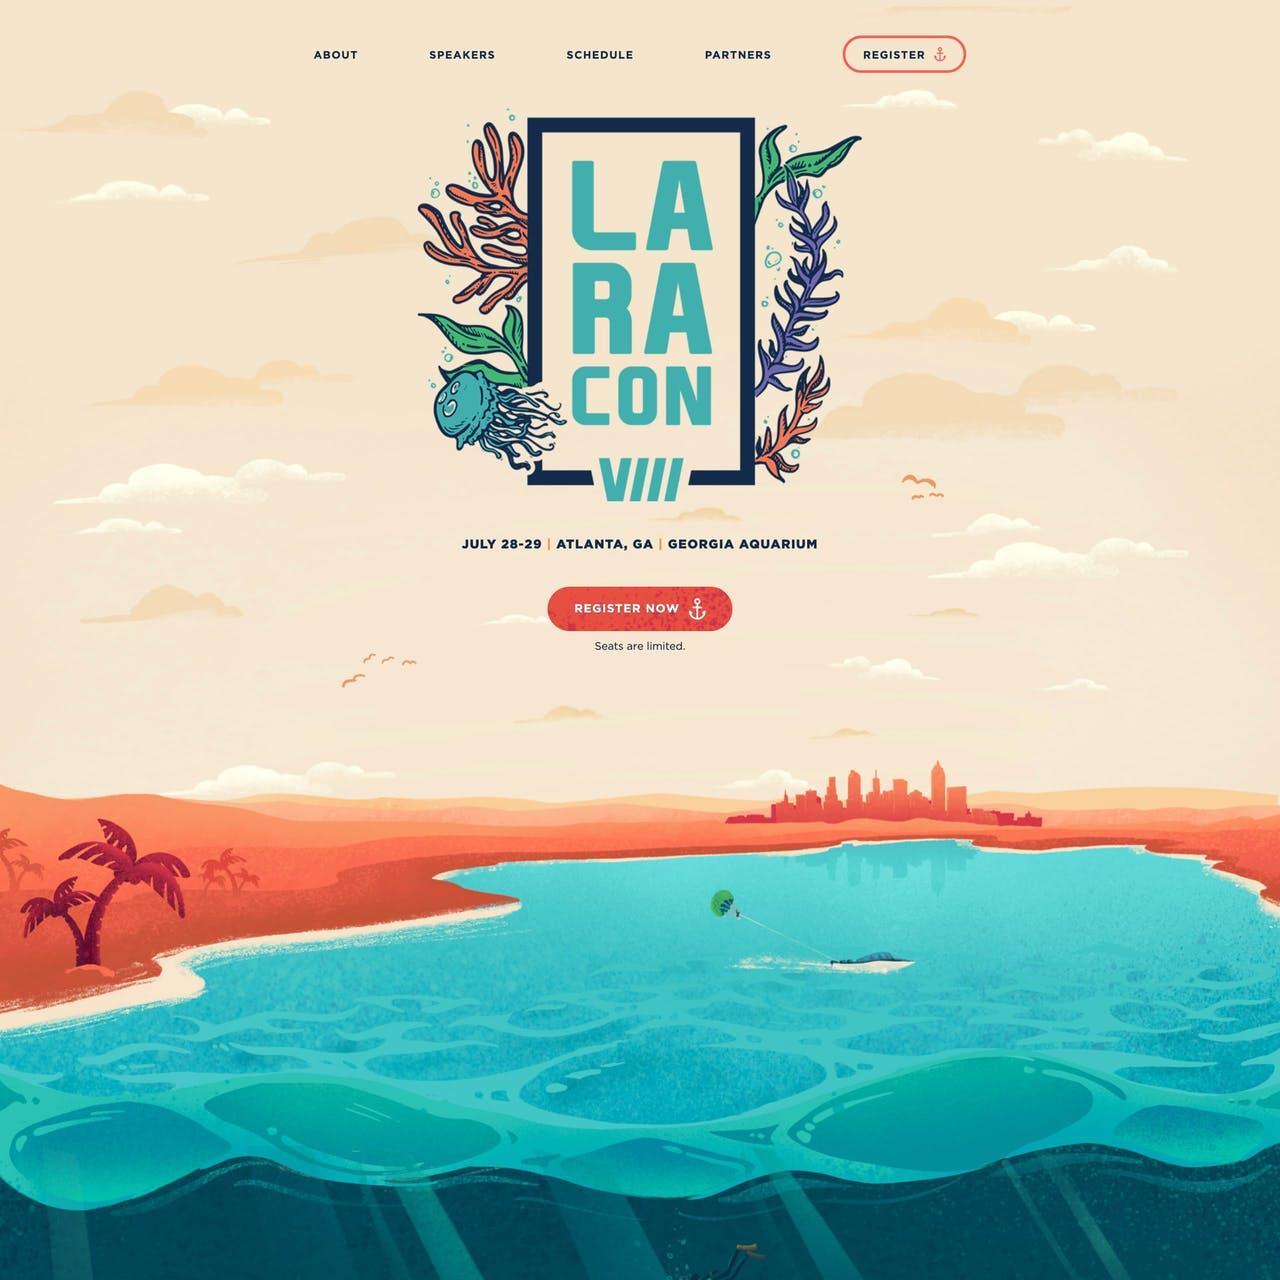 Laracon VIII Website Screenshot